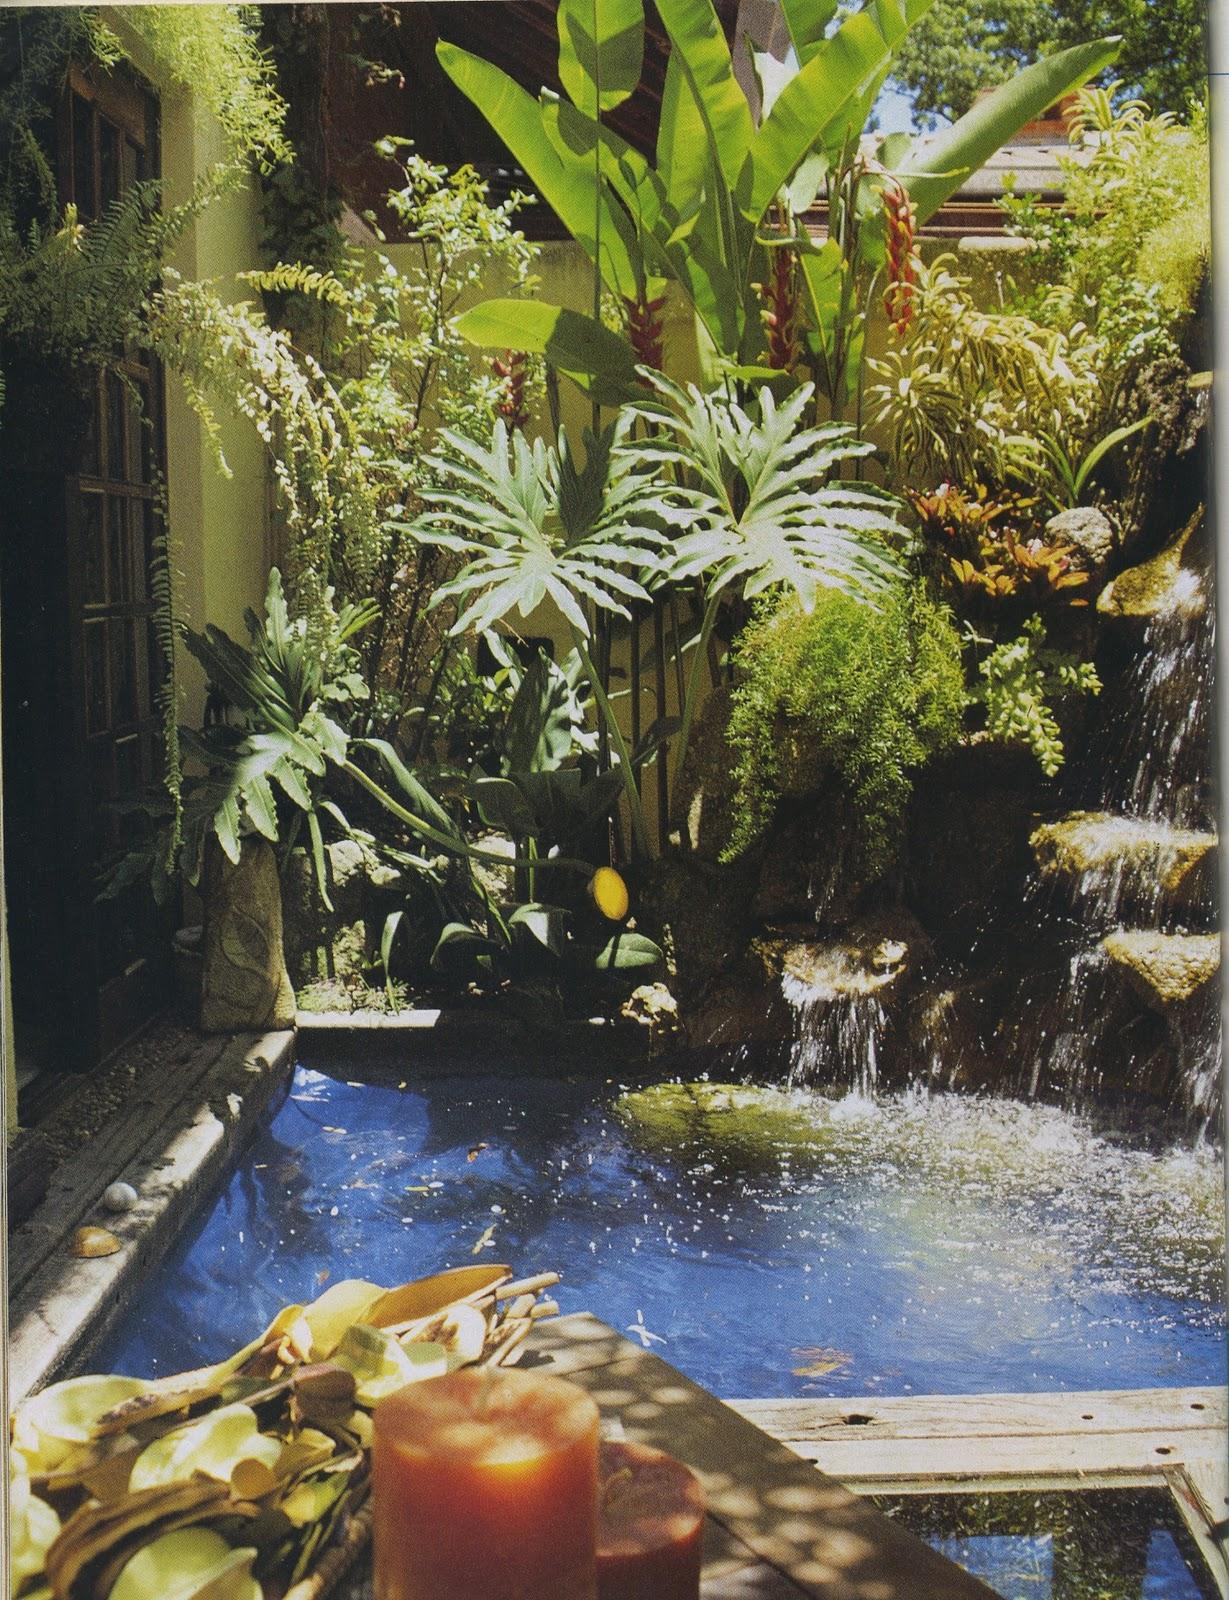 imagens de jardim tropicaltrilhadomato [Jardins] Jardim Tropical